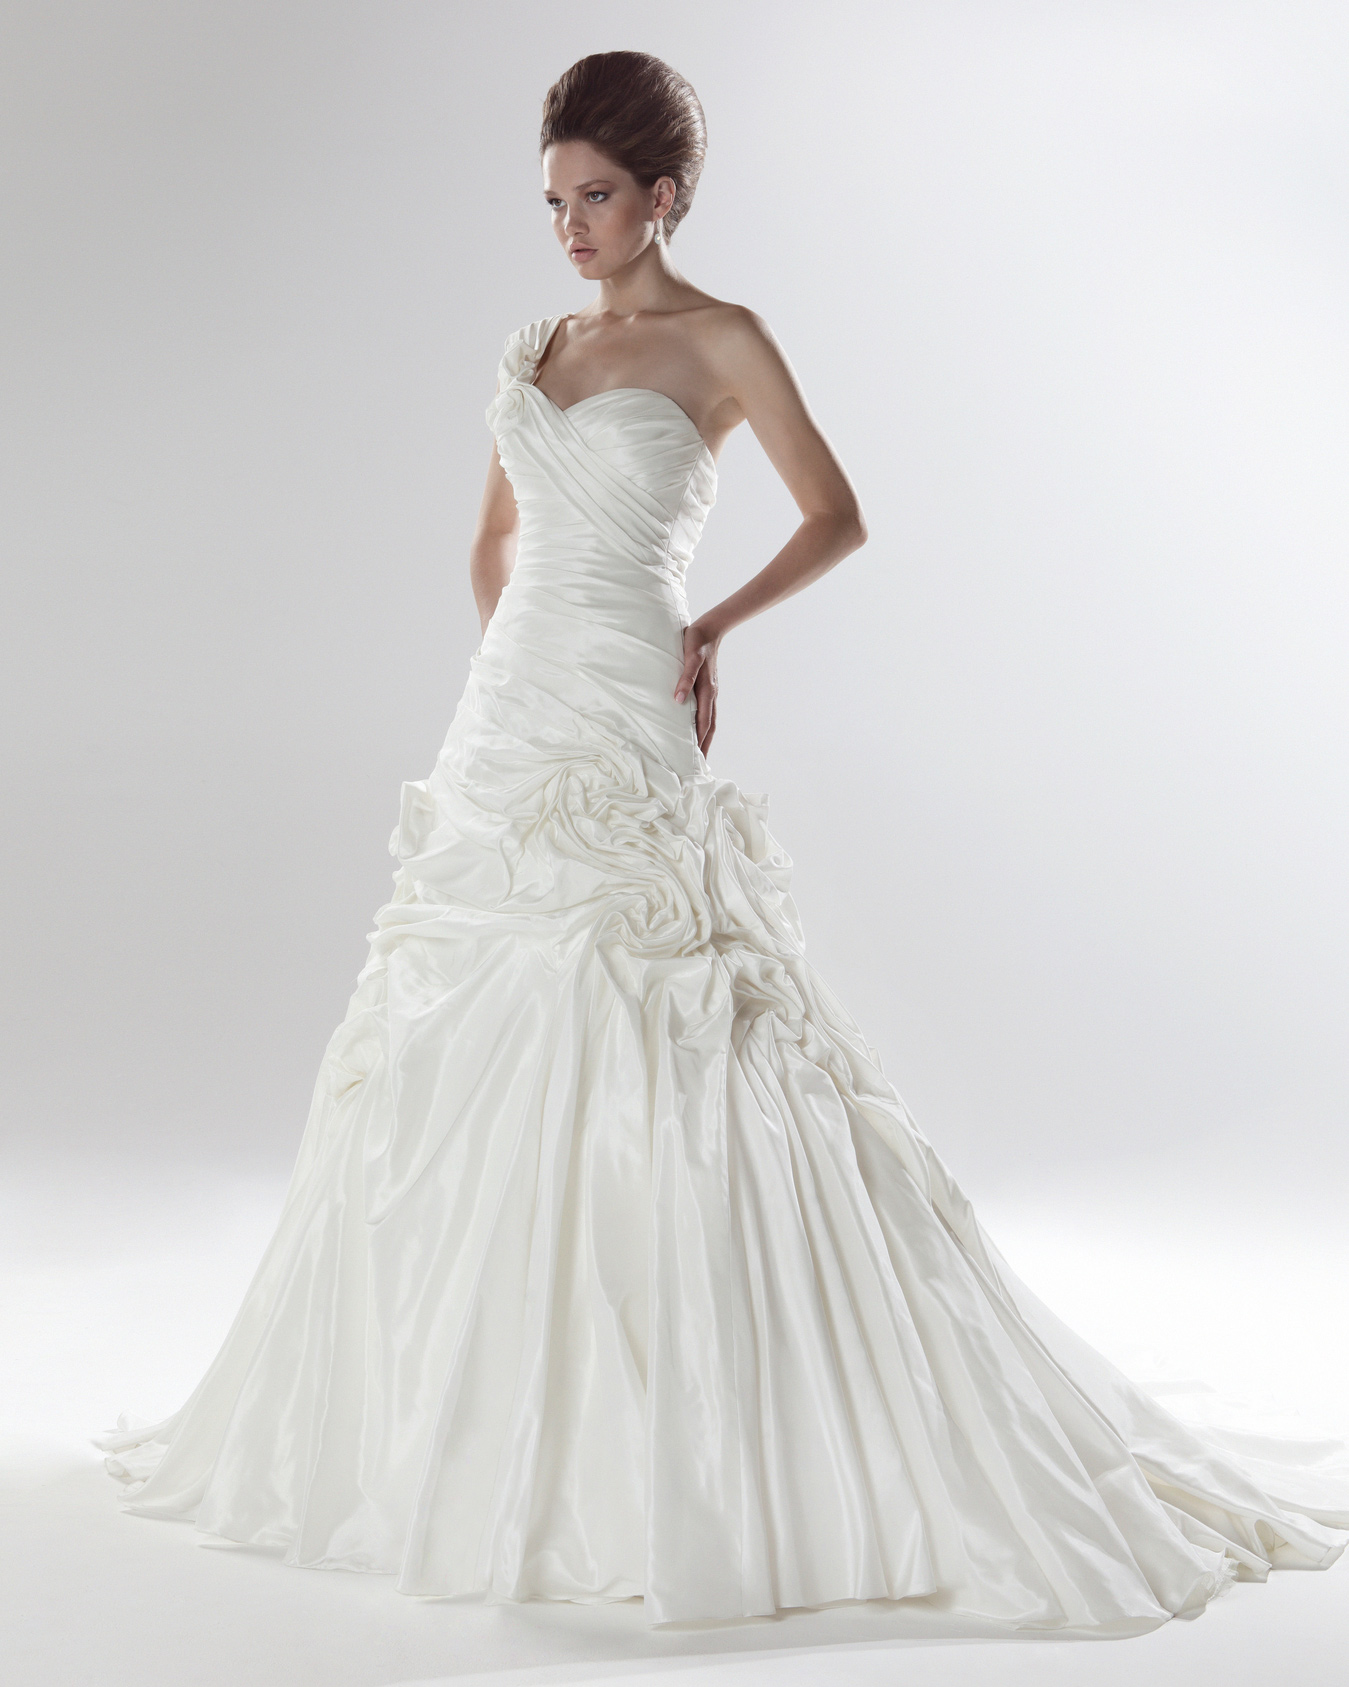 ellis-bridal-11197.jpg